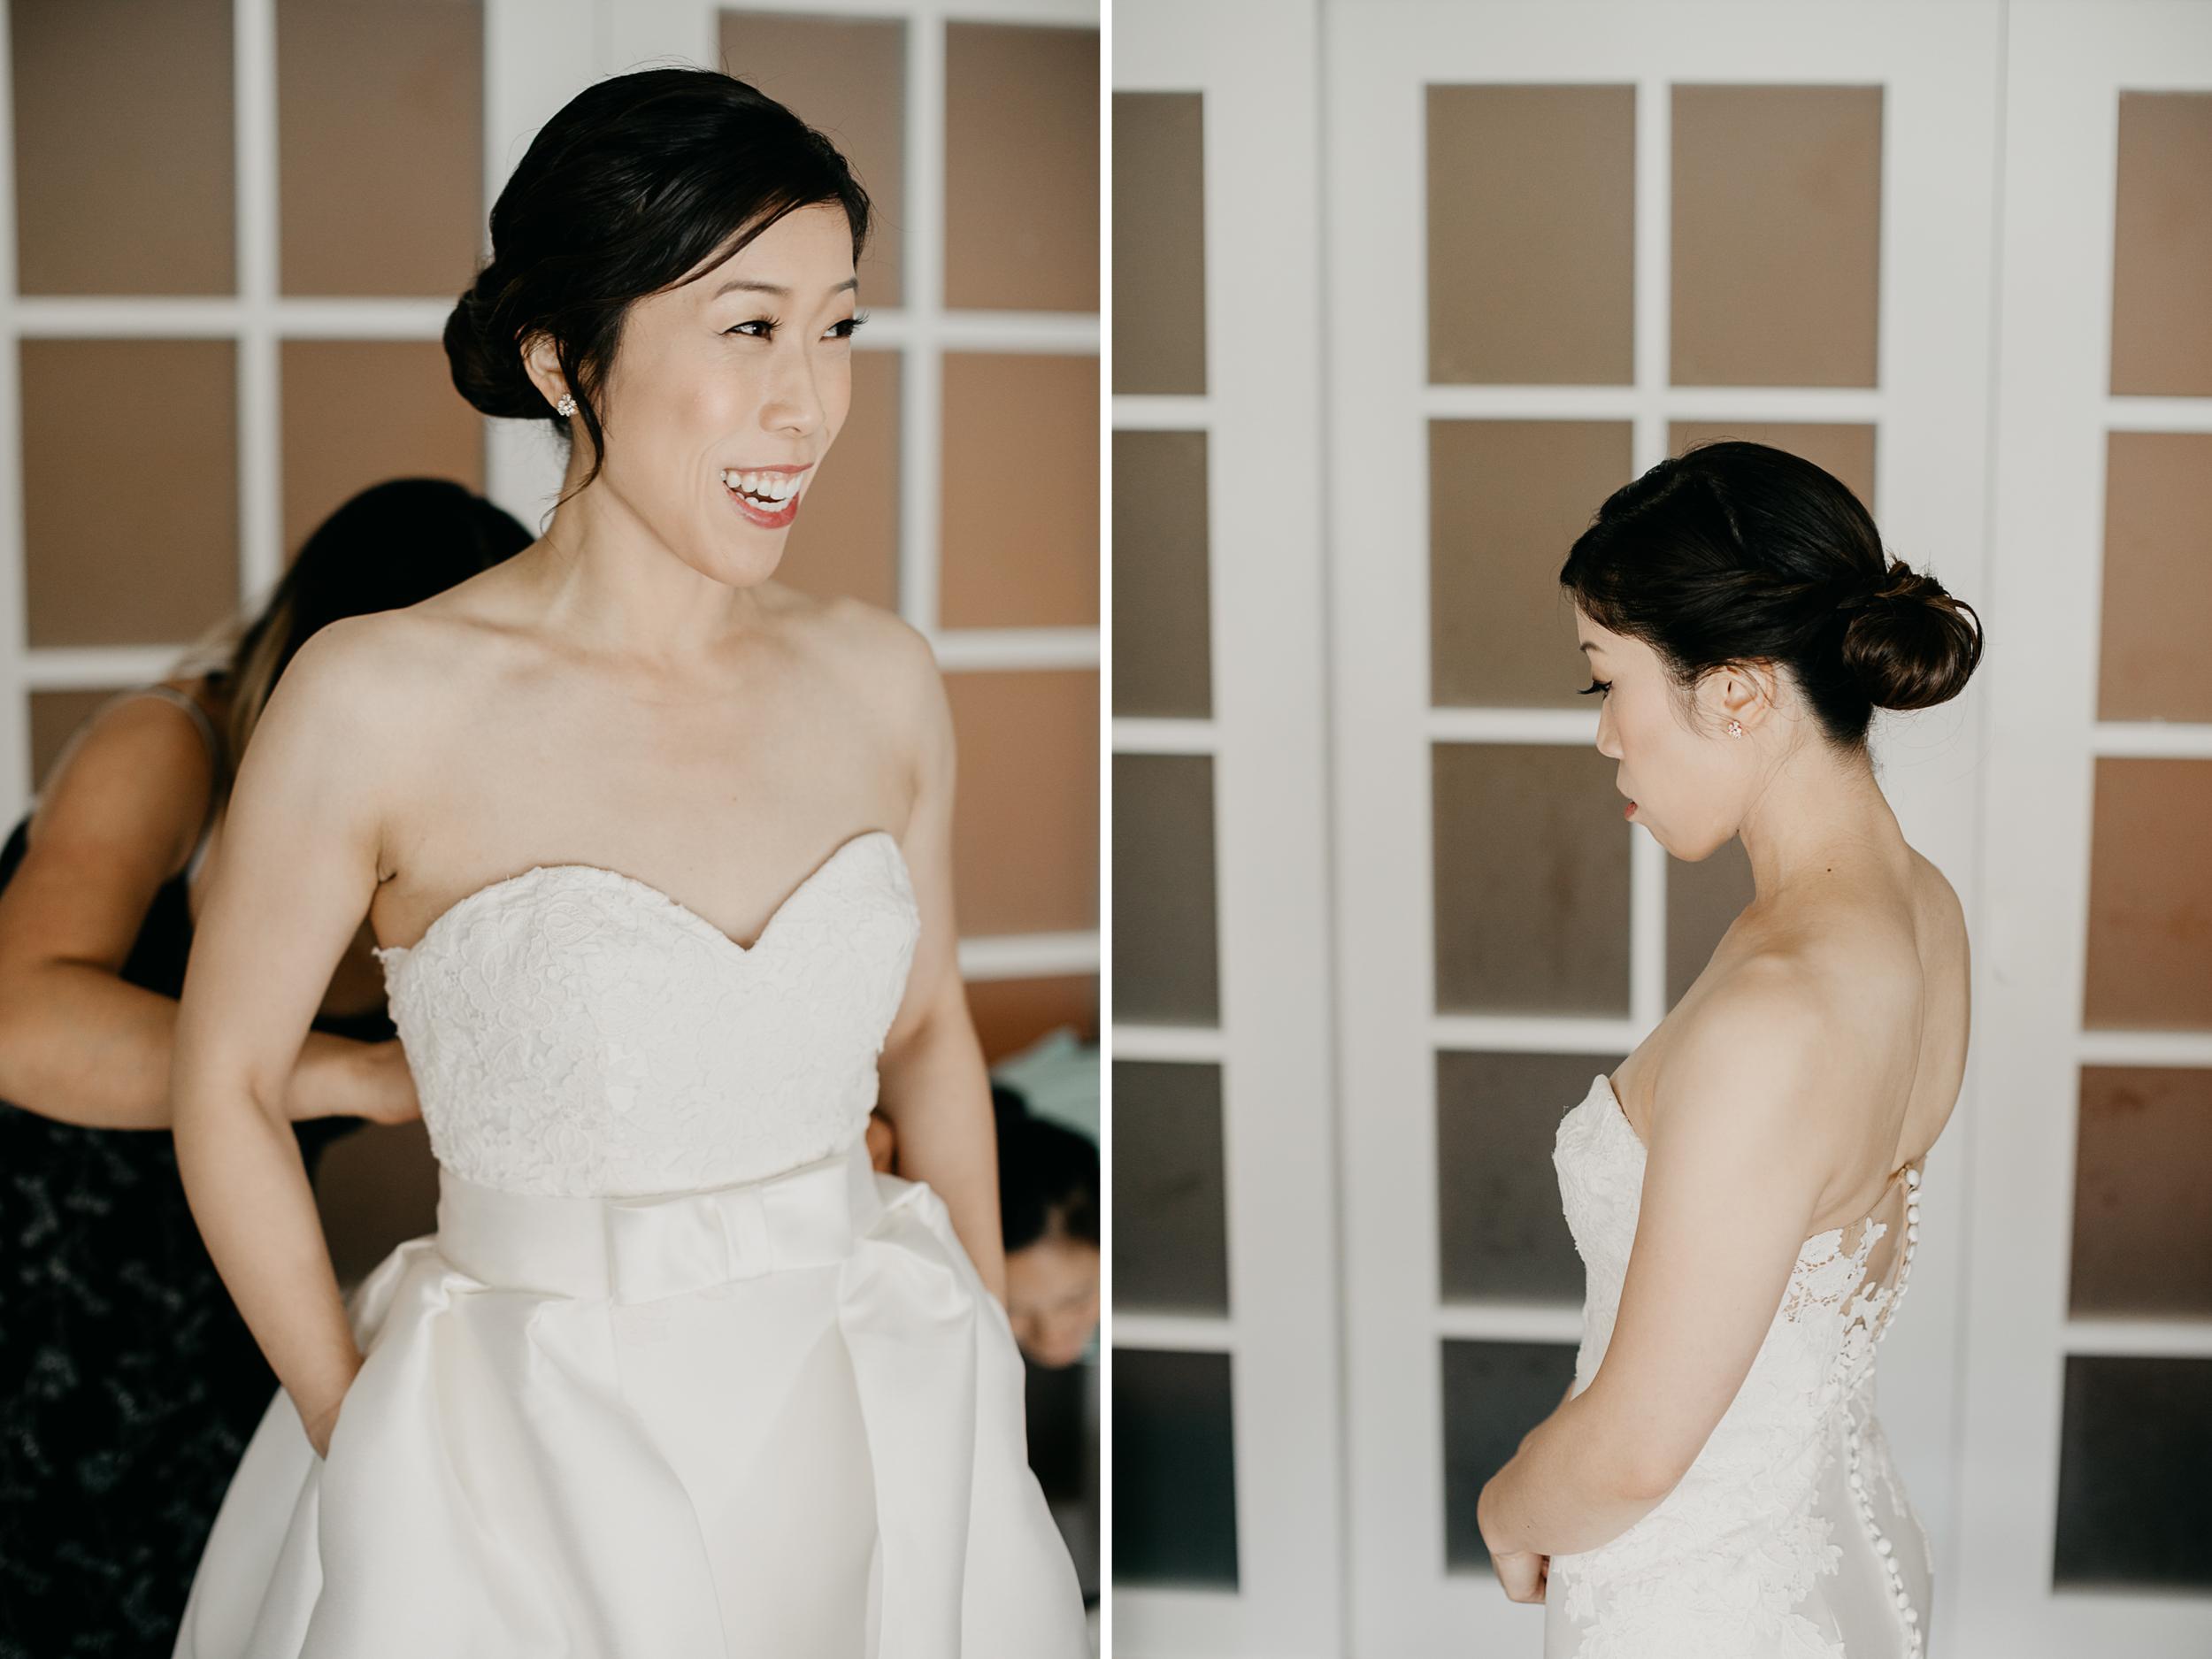 Mindy_Bo_Boston_Wedding_MIT_HotelCommonwealth_002.jpg